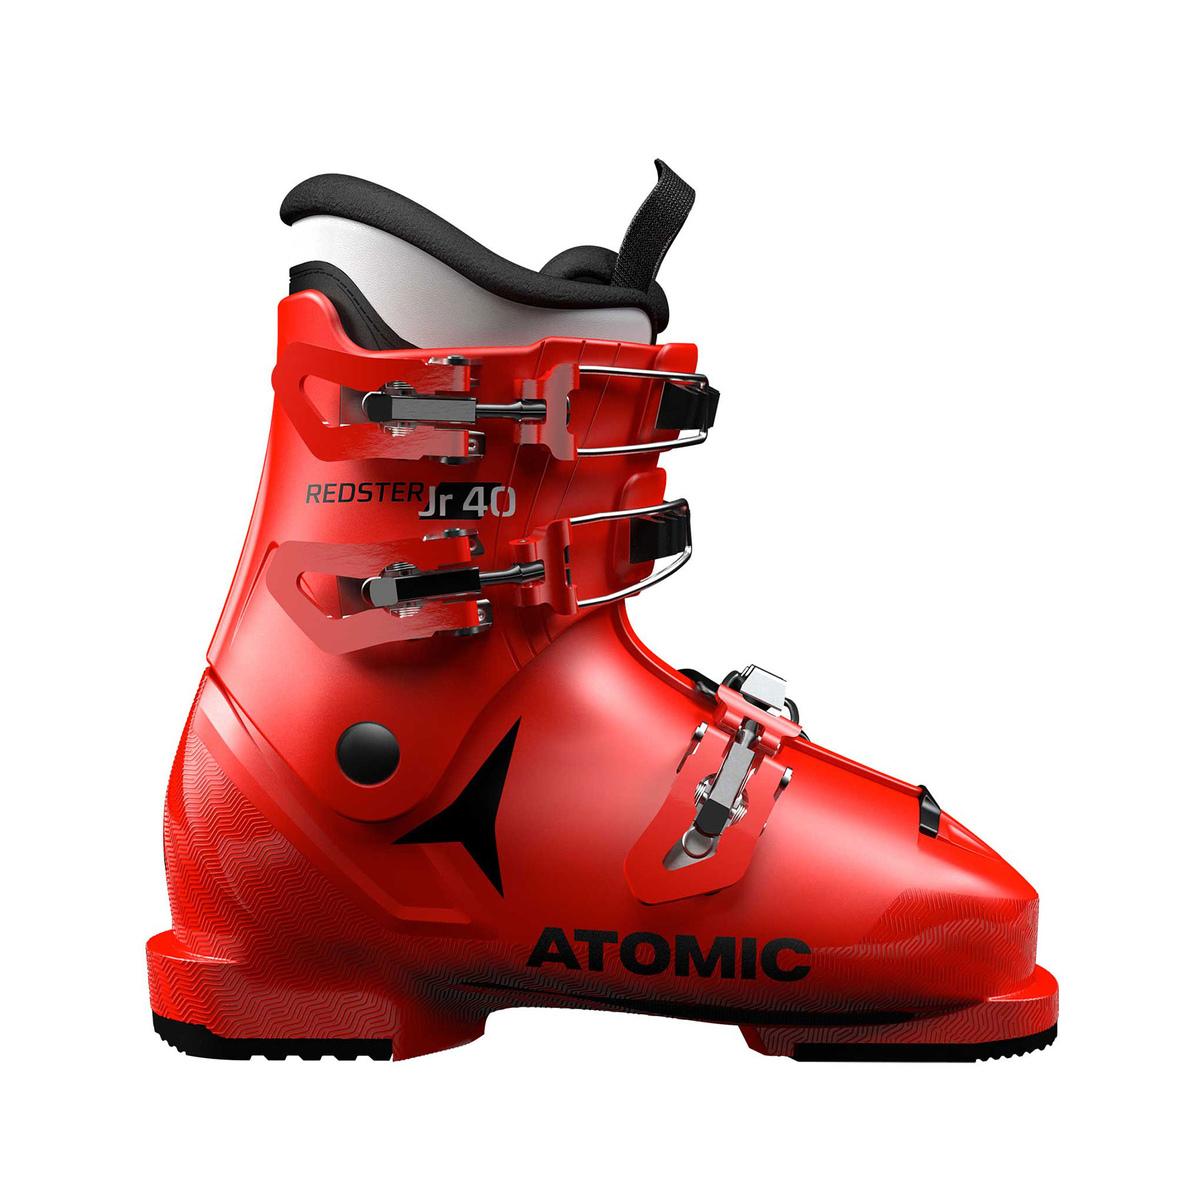 _PREMANUFACTURE_PRICE Atomic redster 40 bambino